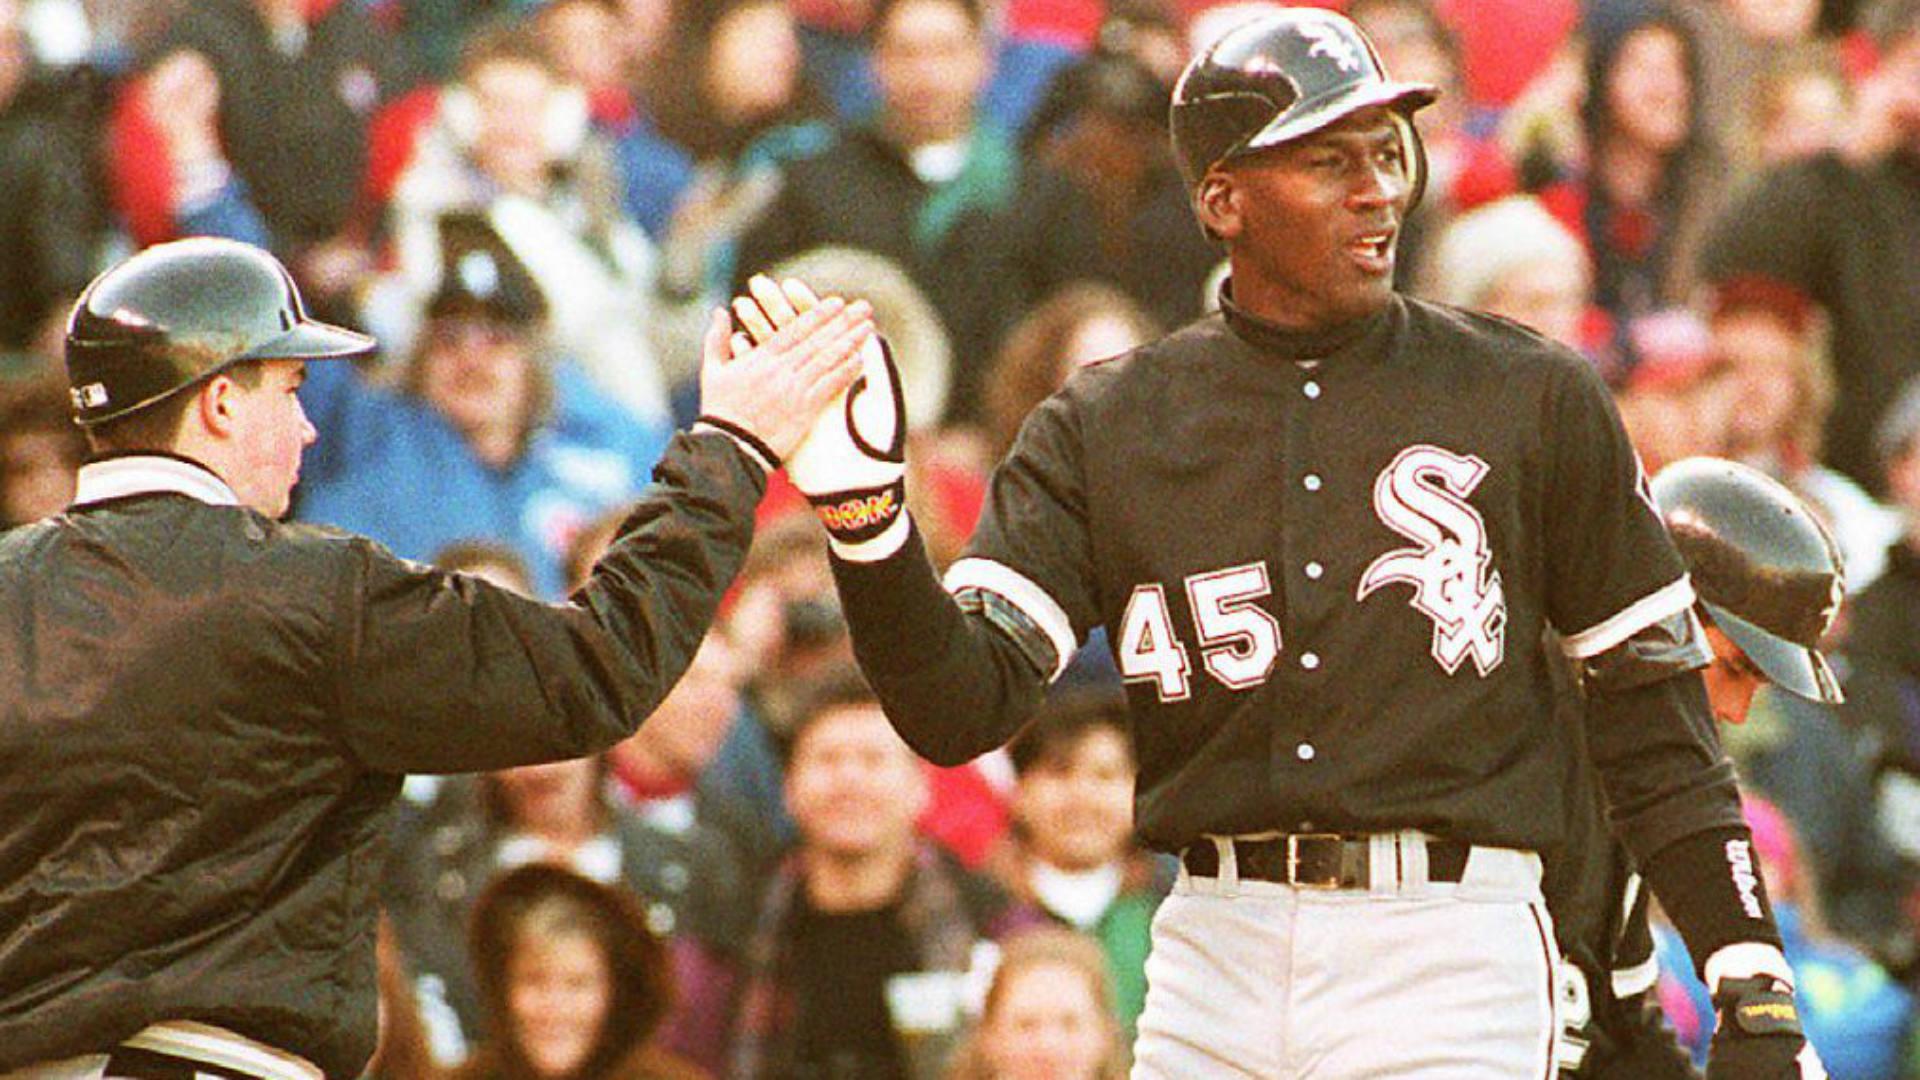 Michael Jordan's best — and worst — baseball moments 1